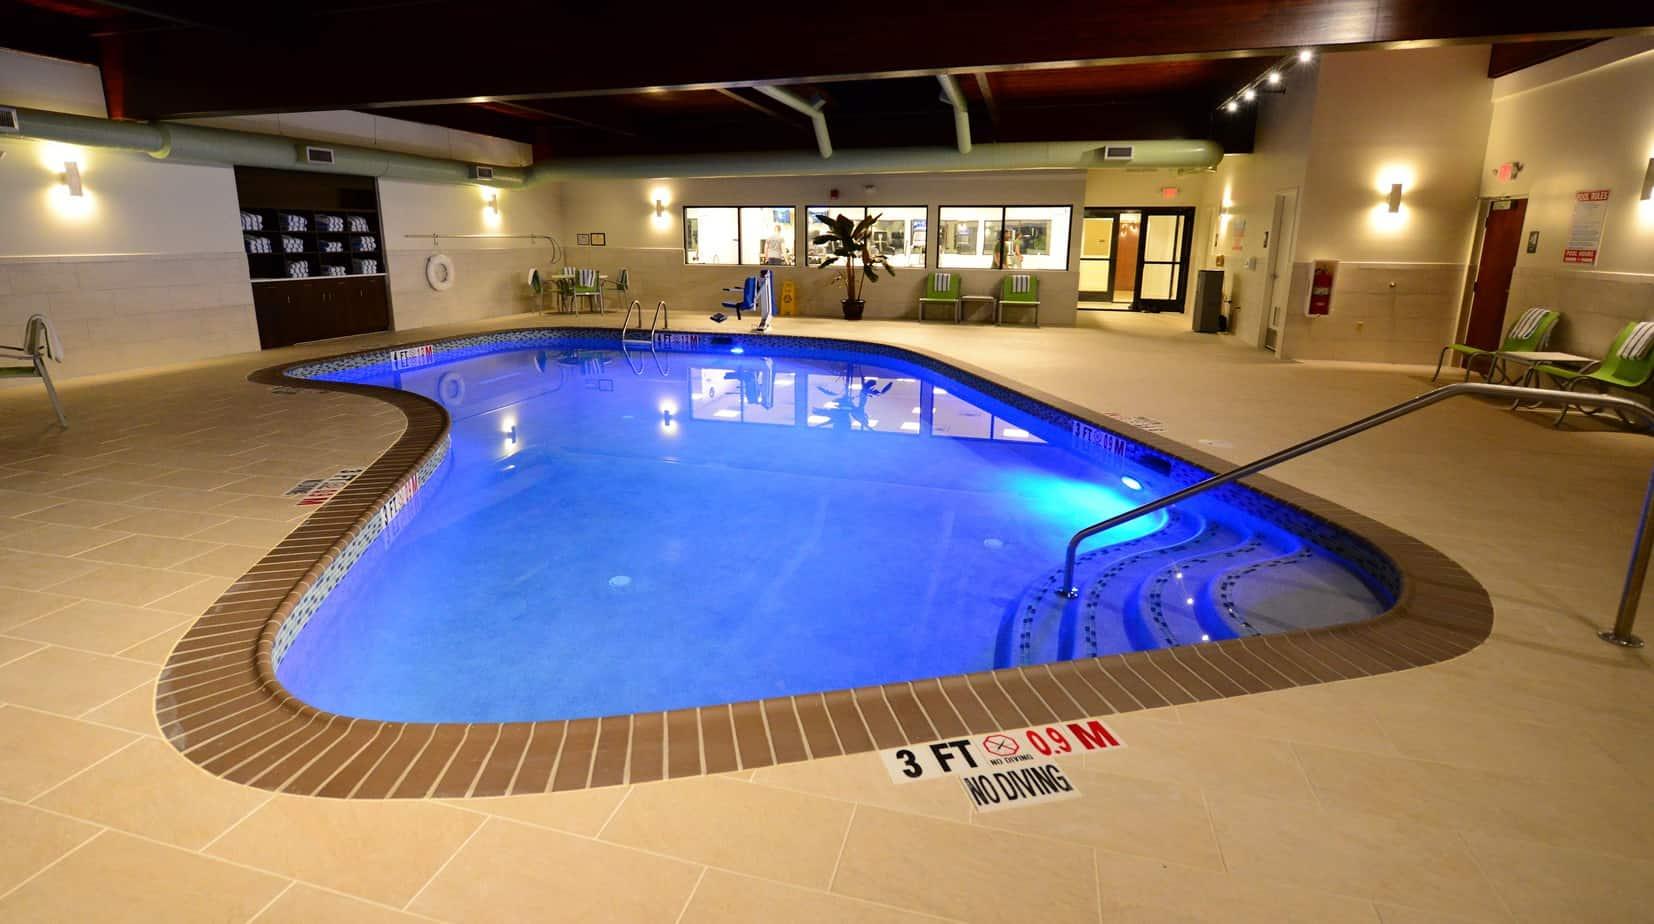 Sankey Pools - FINISHED POOL RENOVATION (Holiday Inn - Williamsport, PA)